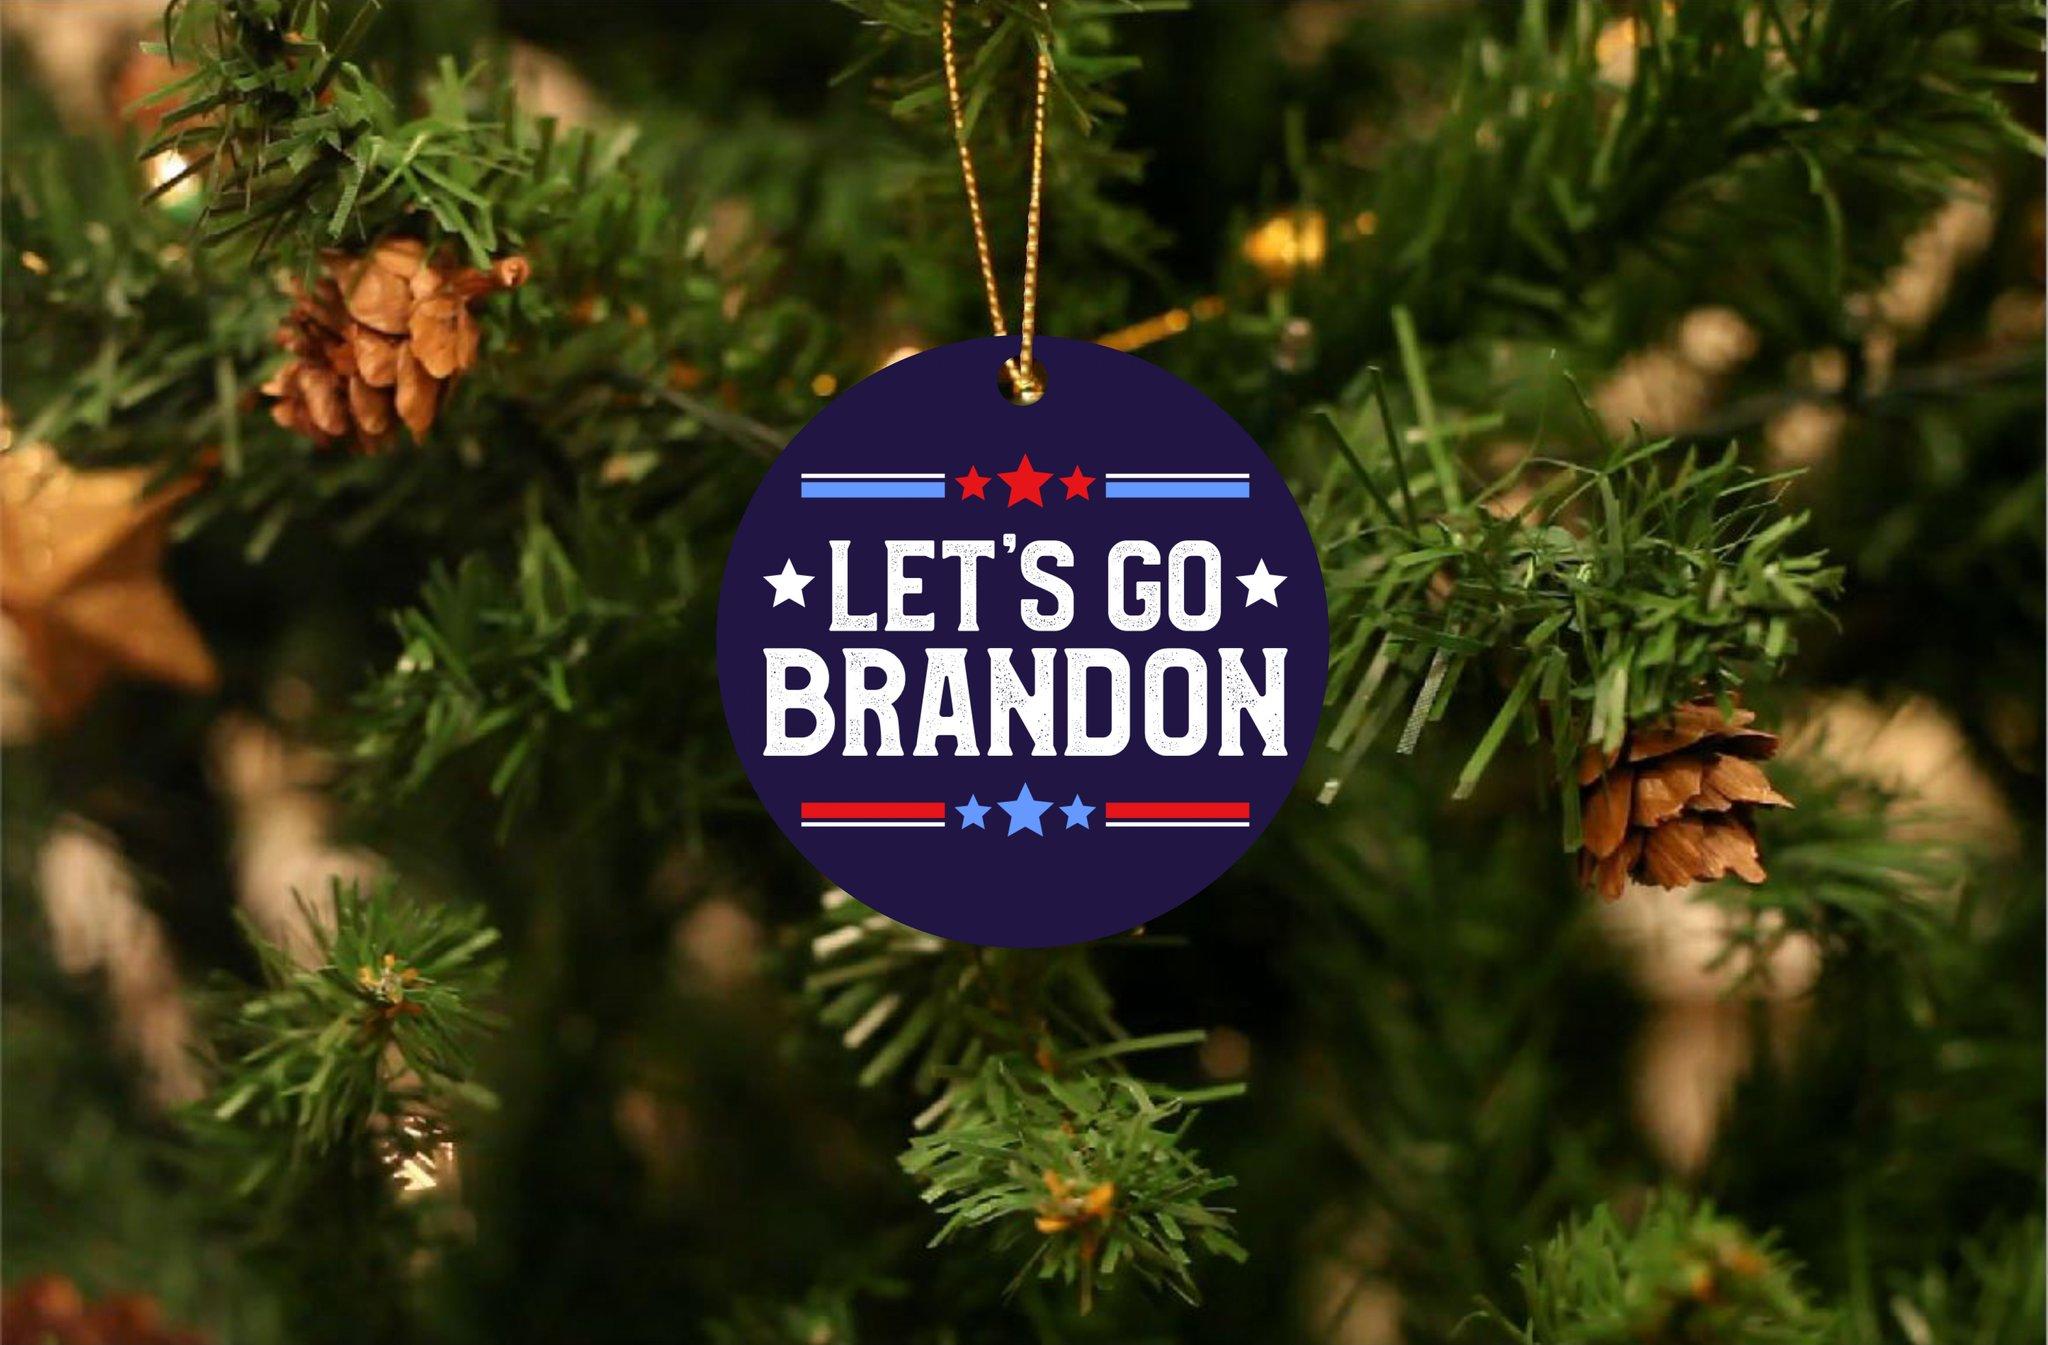 Let's Go Brandon Christmas Ornament